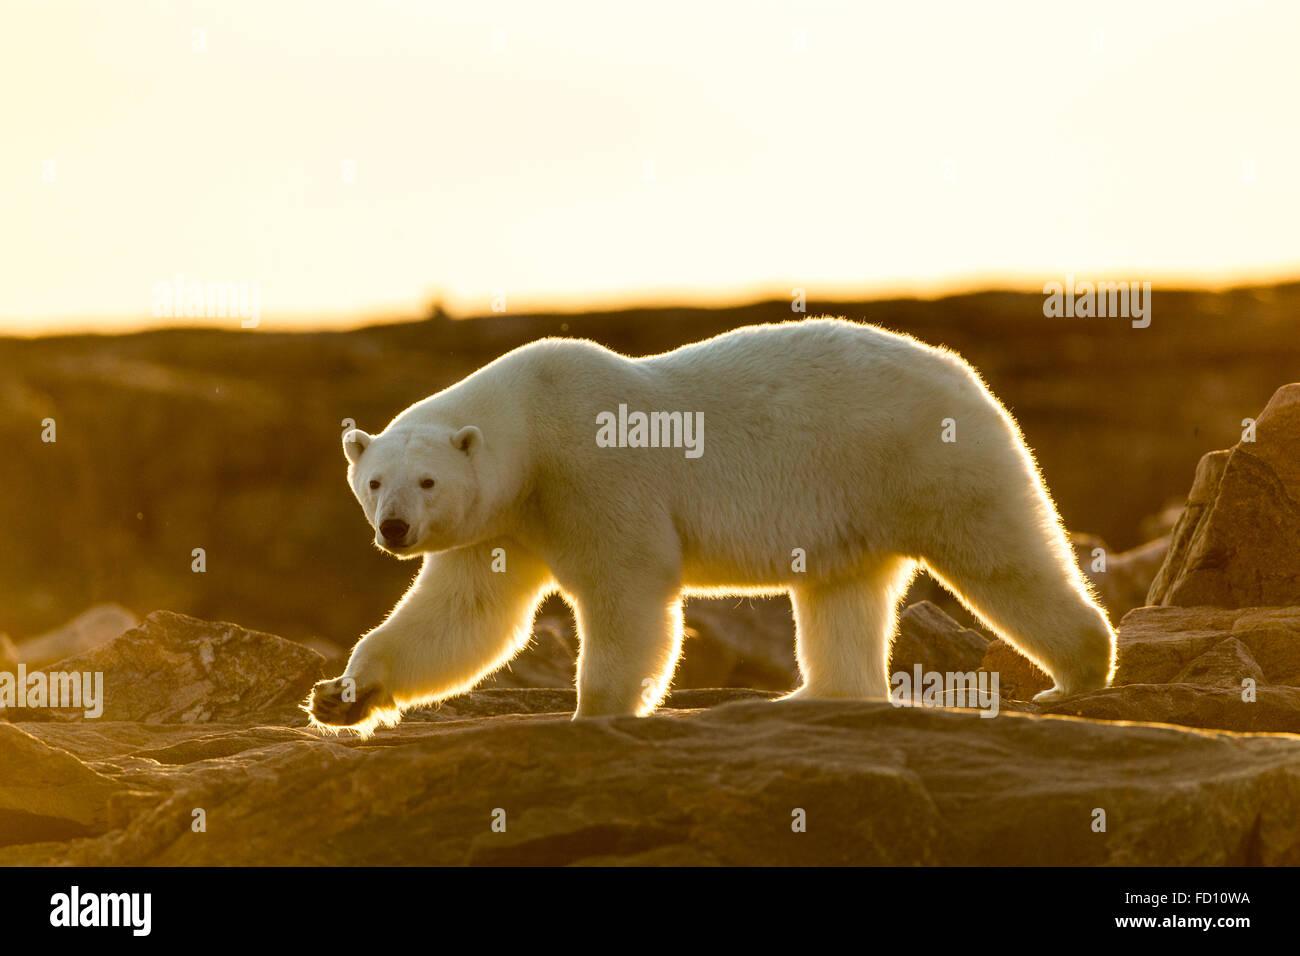 Canada, Nunavut Territory, Setting midnight sun lights Polar Bear (Ursus maritimus) walking along rocky shoreline - Stock Image